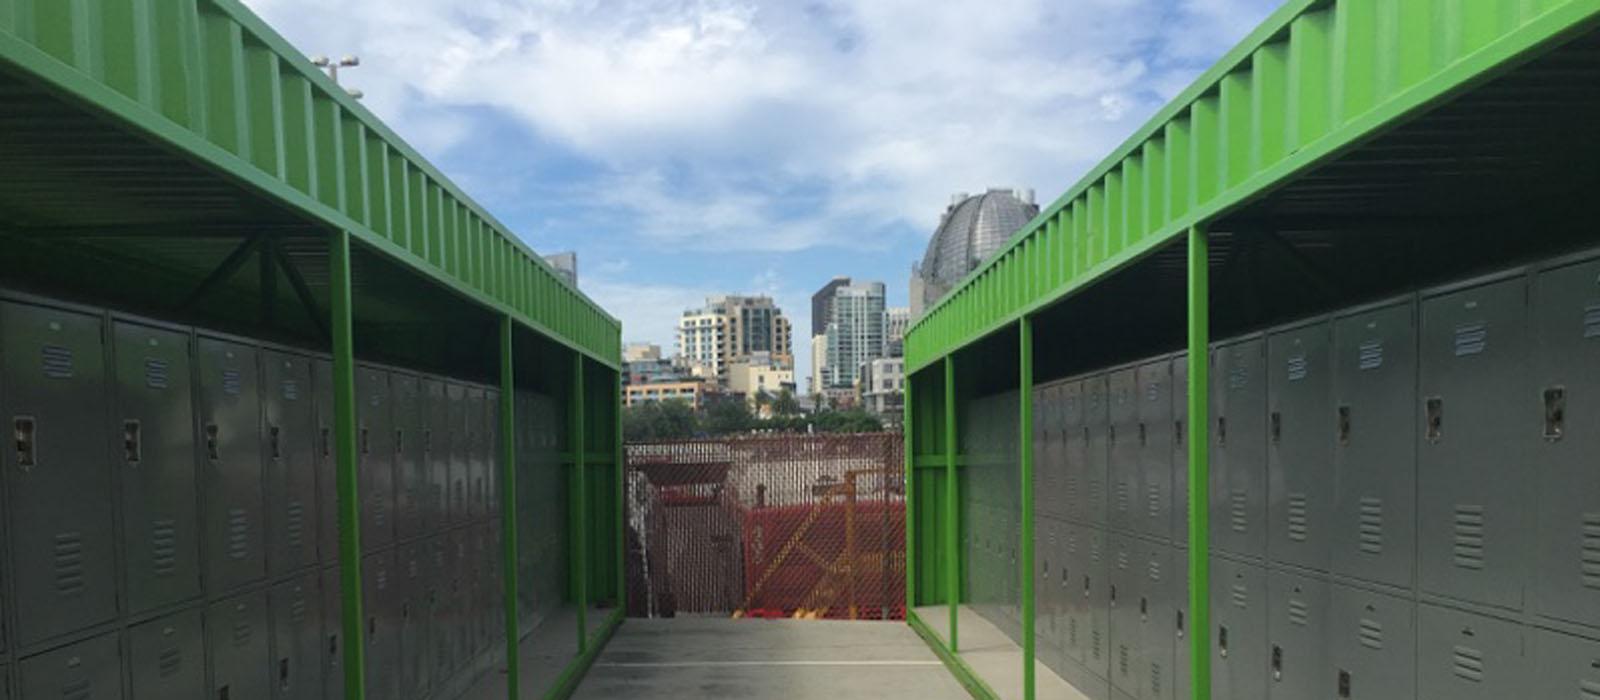 transitional-storage-center-lockers-01.jpg